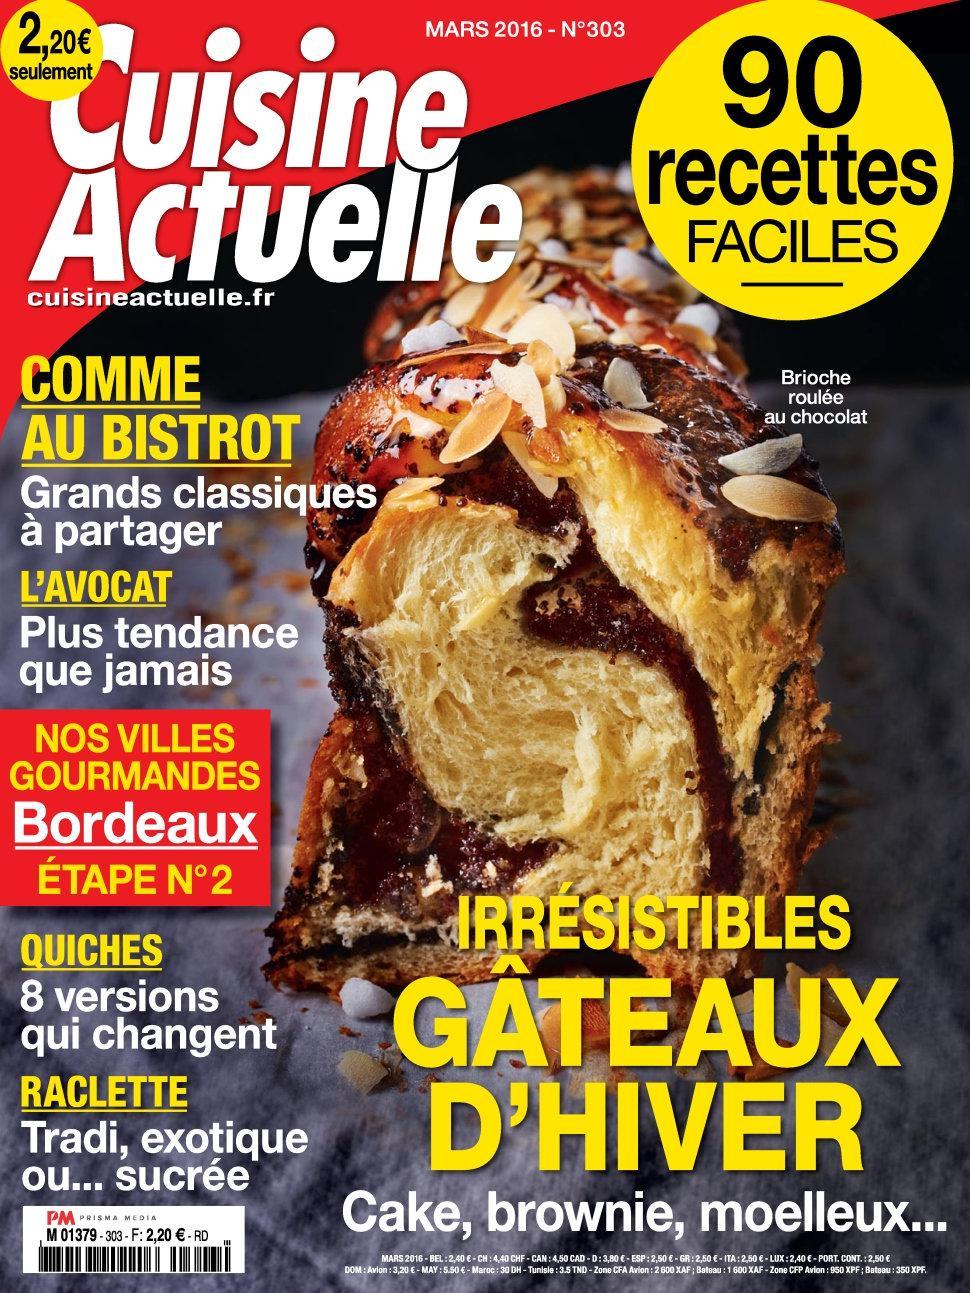 Cuisine Actuelle N°303 – Mars 2016